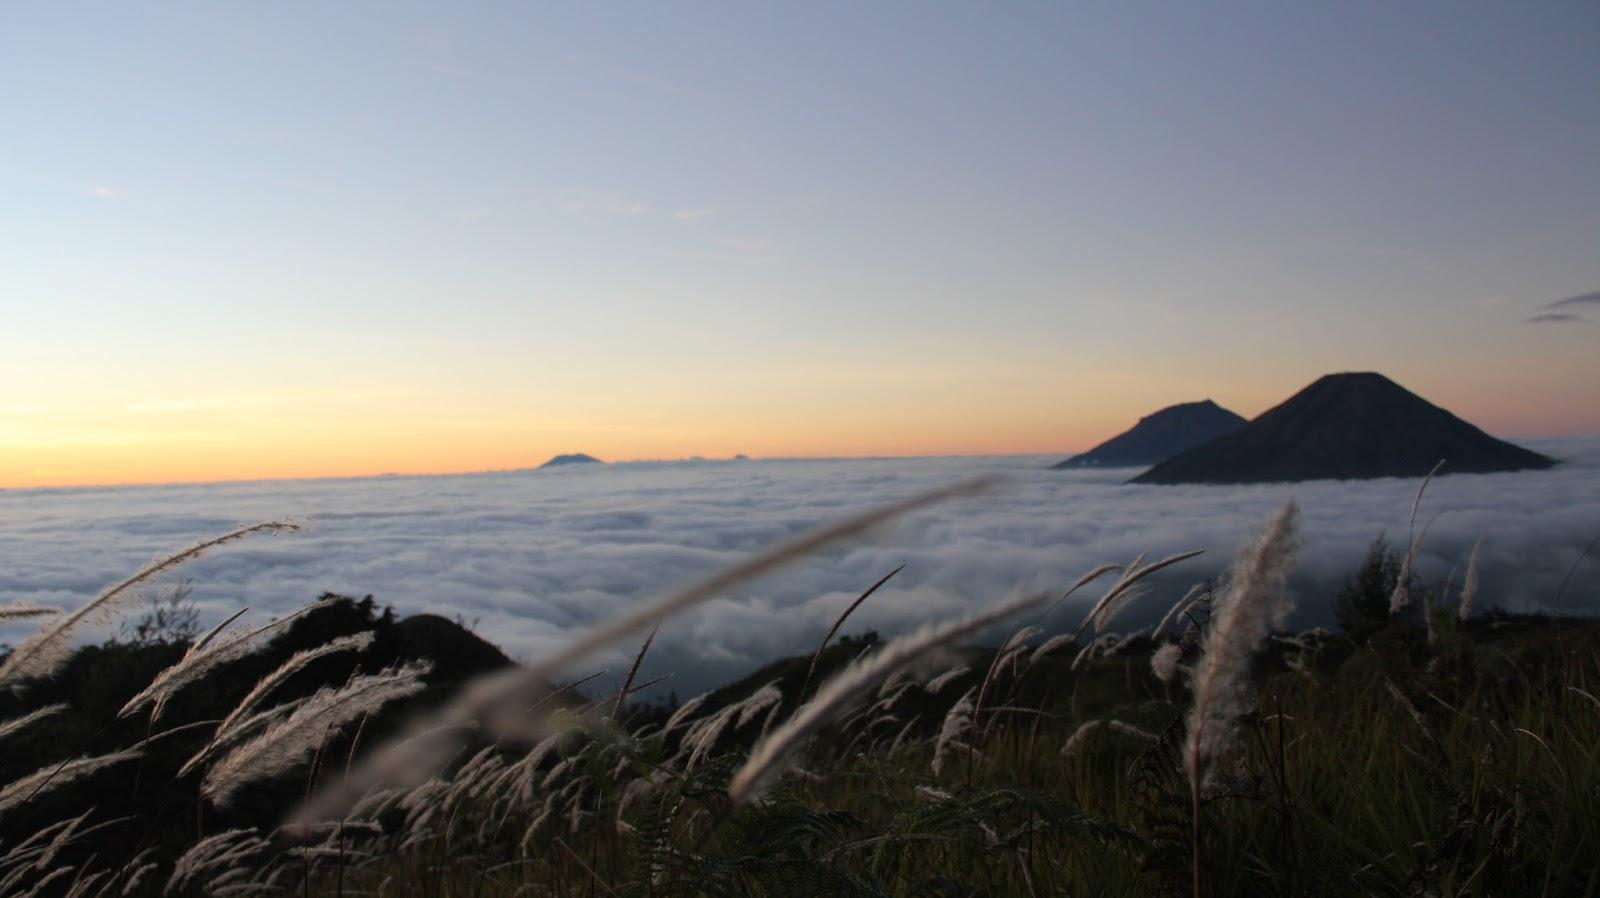 Tempat Wisata Dieng Wonosobo, Wisata Alam dan Budaya